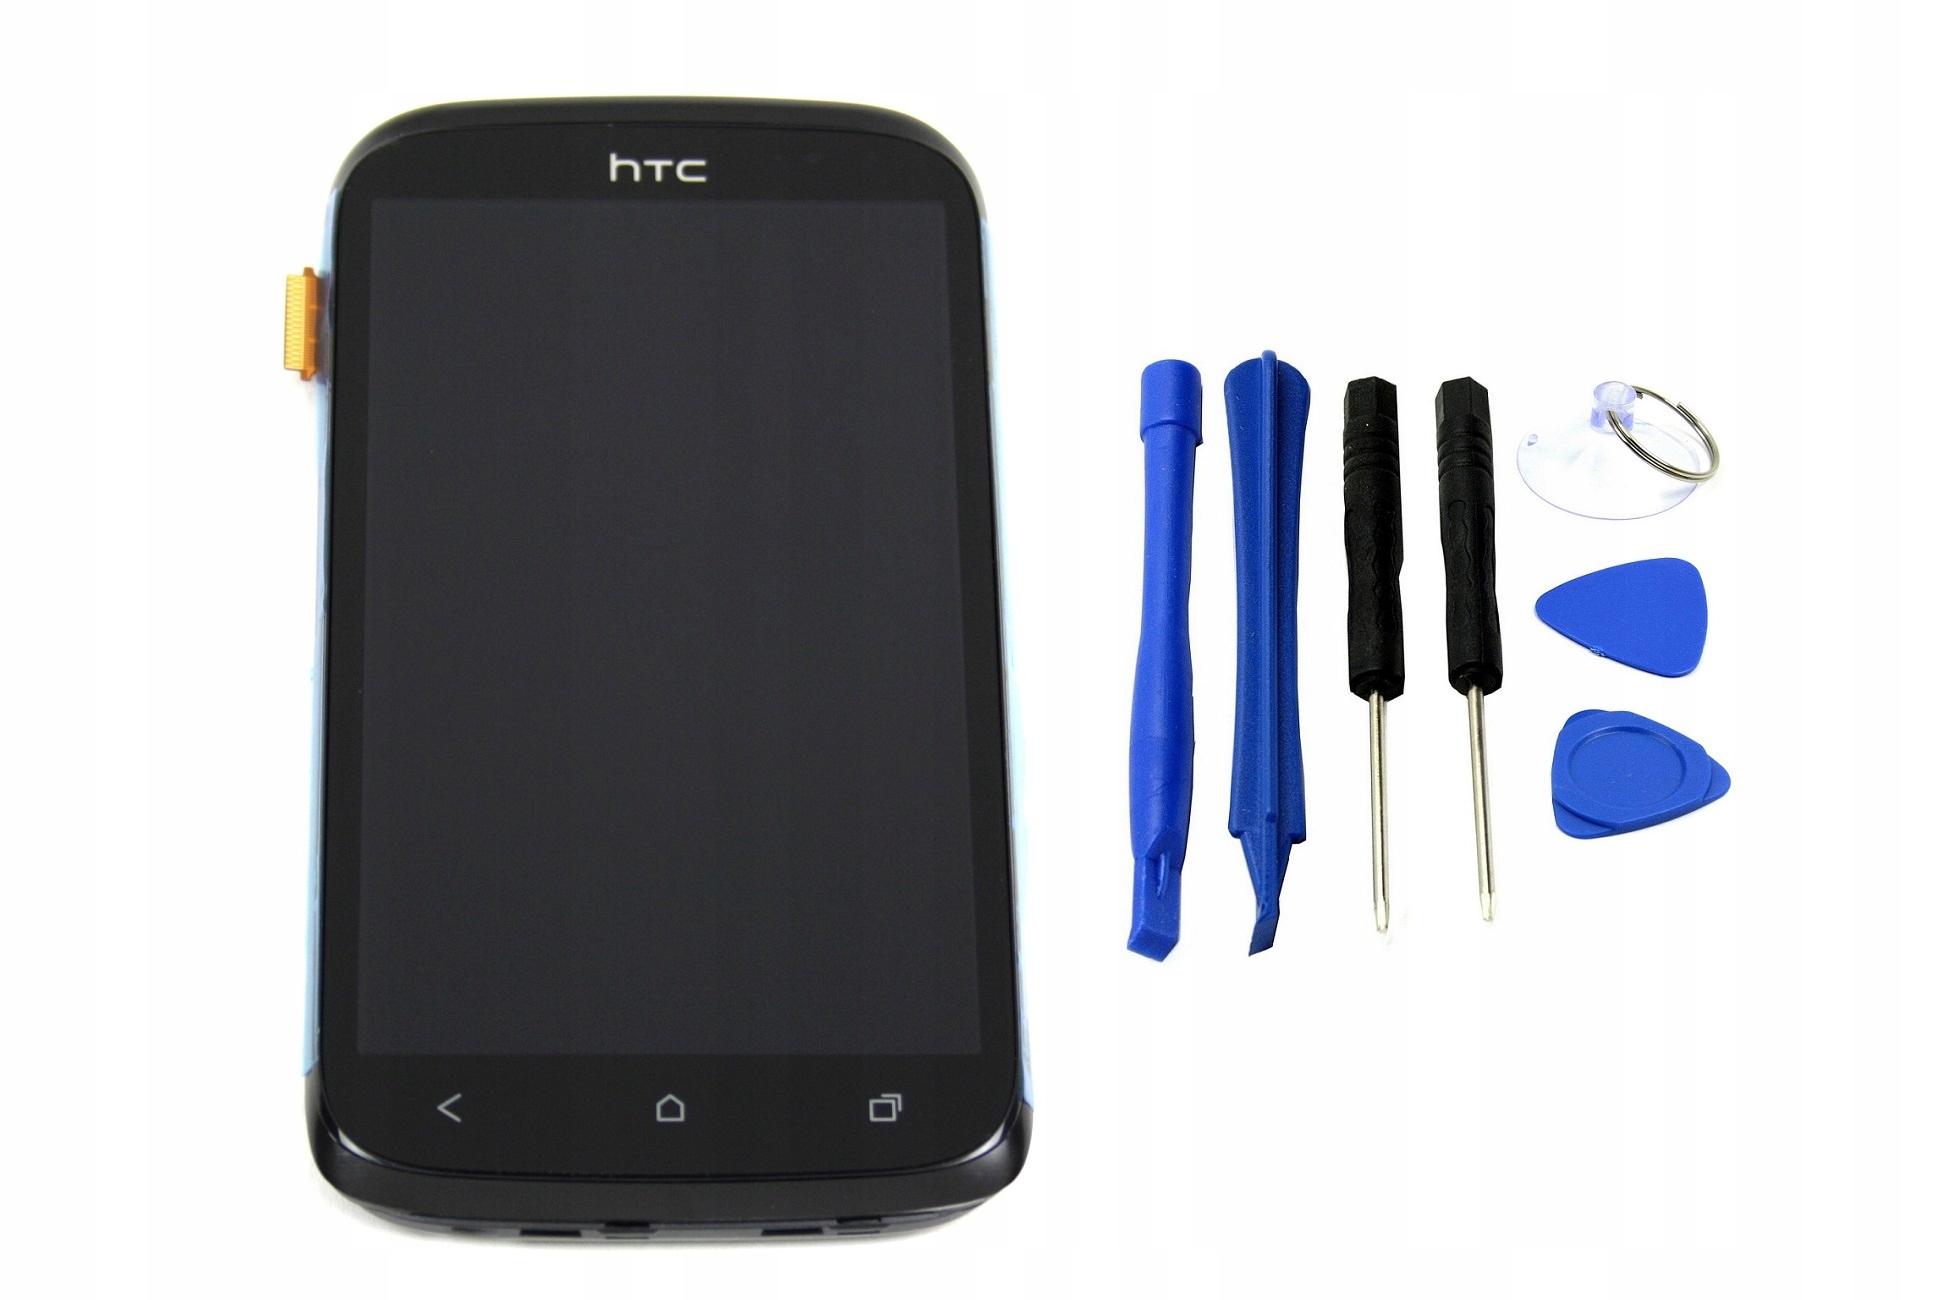 LCD WYŚWIETLACZ EKRAN DOTYK HTC DESIRE X T328E